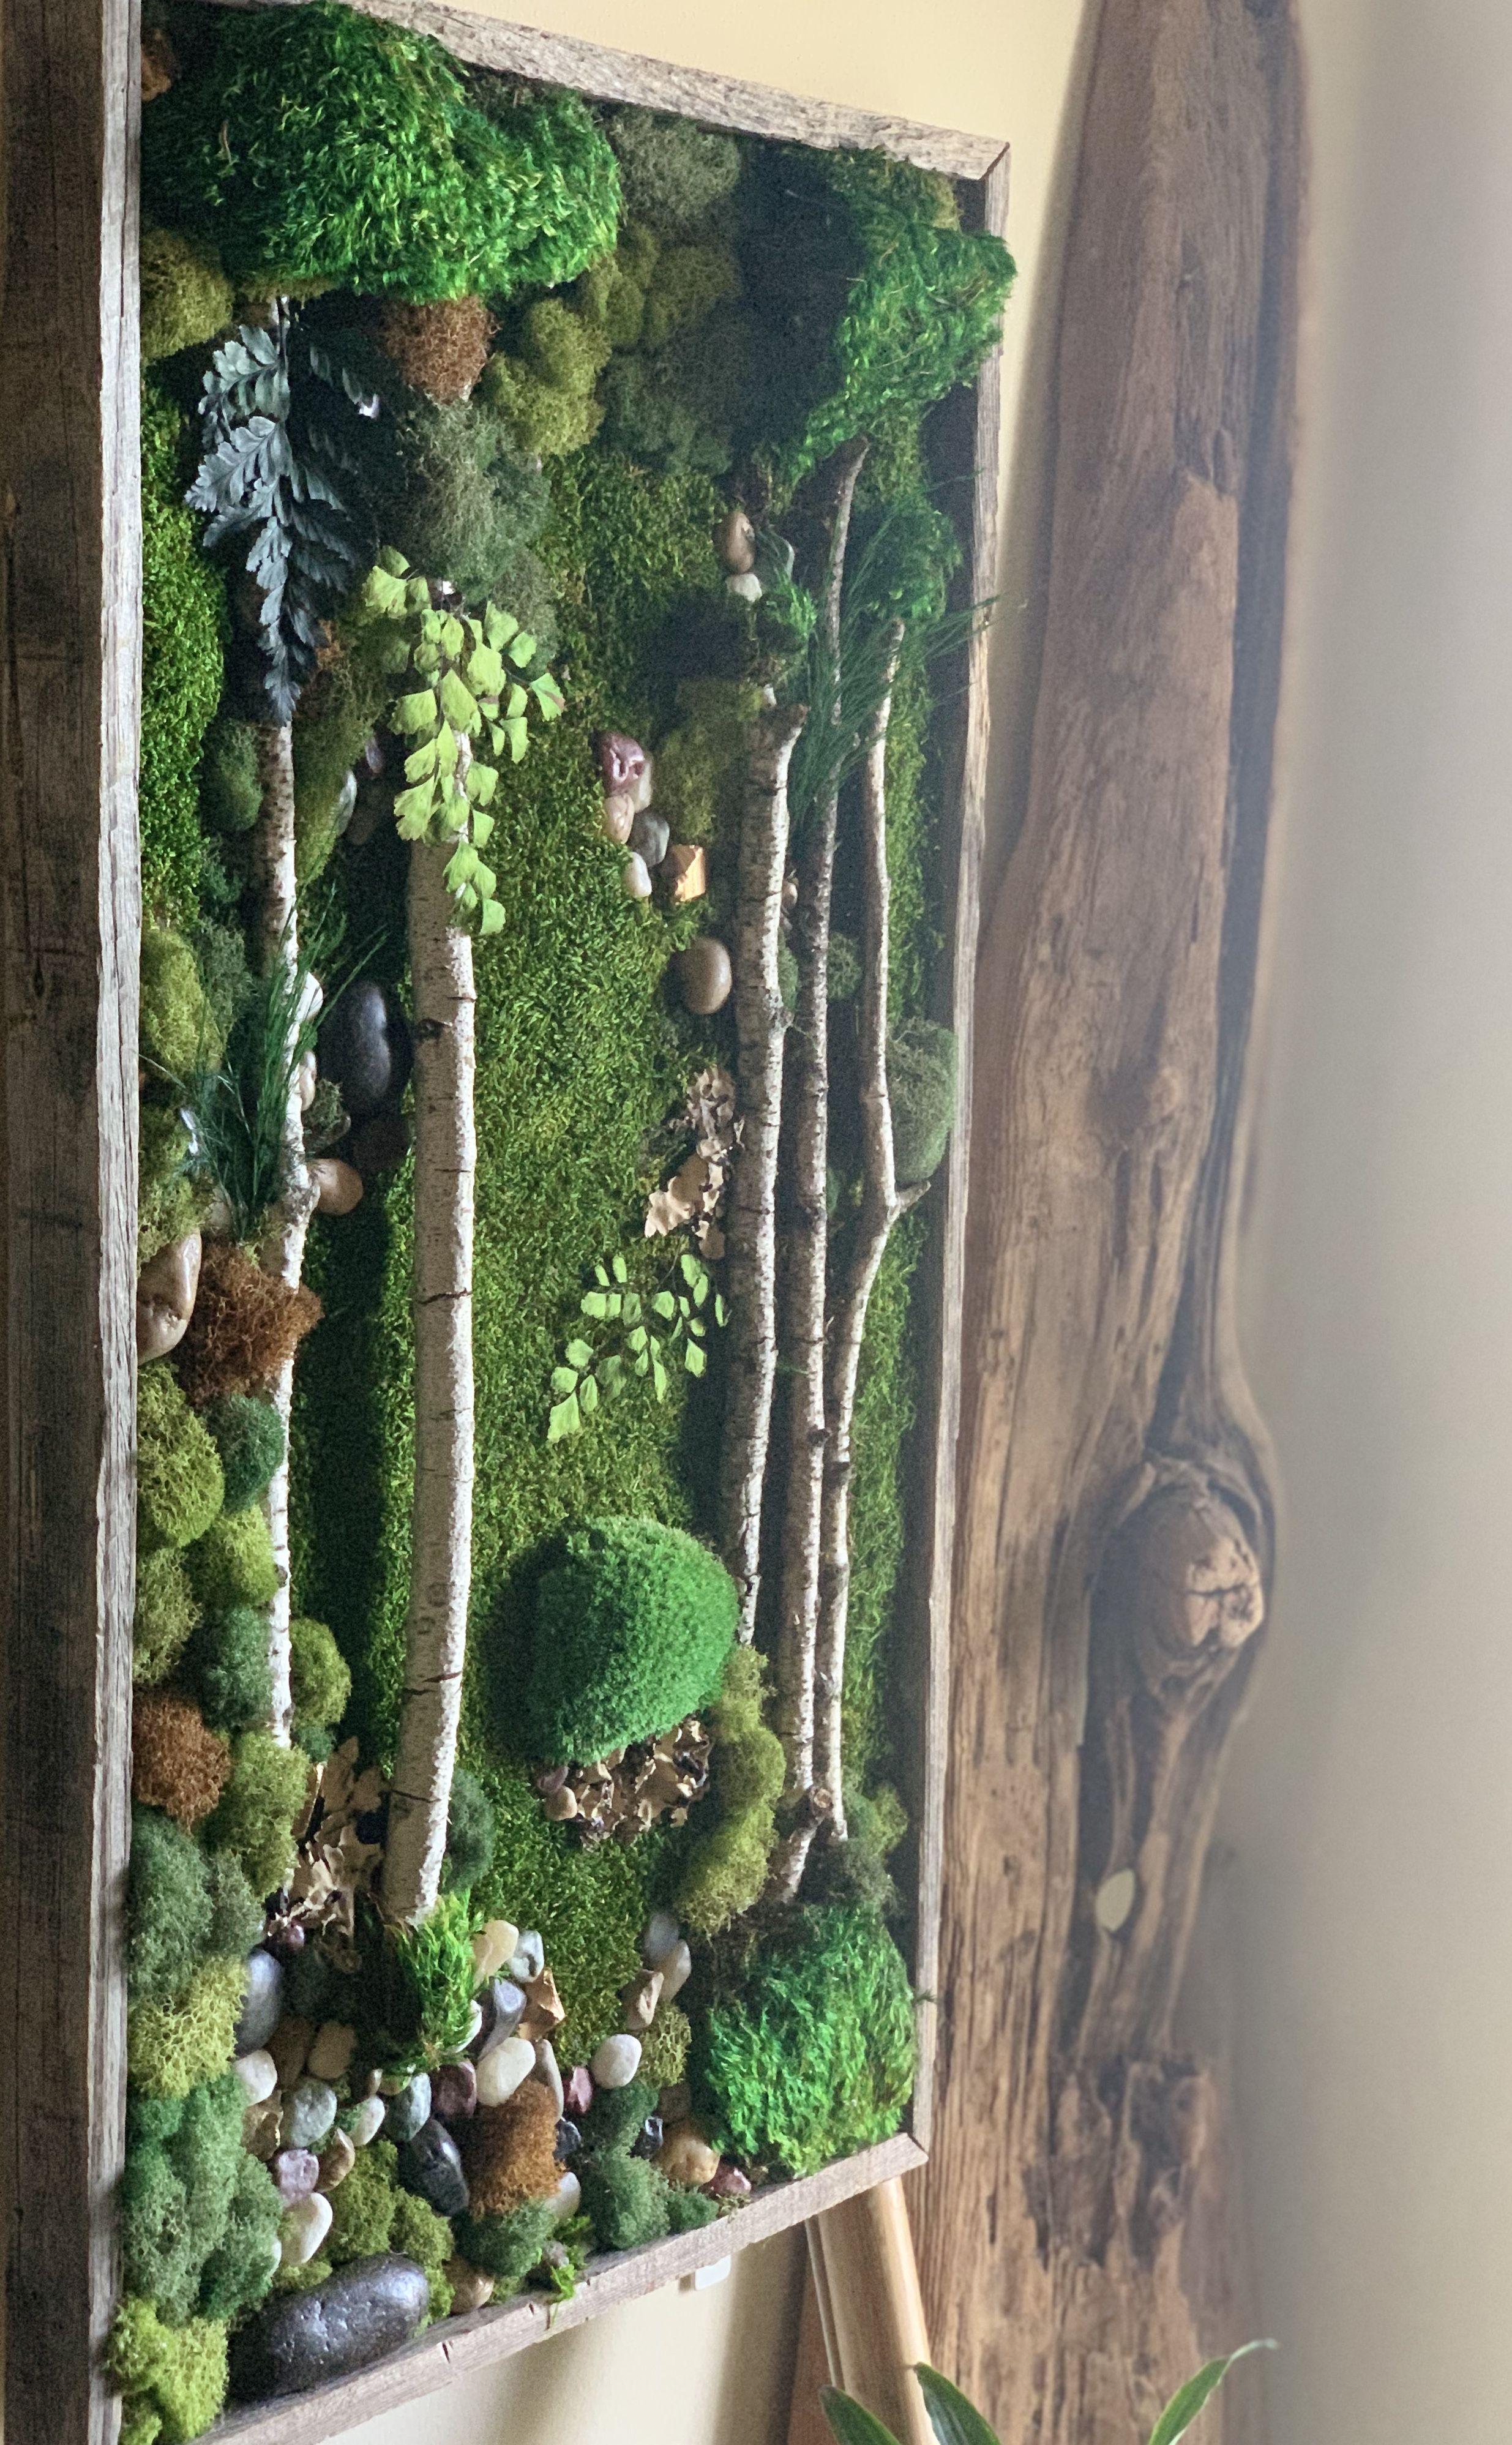 Pin By Whitehaus Living On Whitehaus Living Moss Wall Art Moss Art Moss Wall